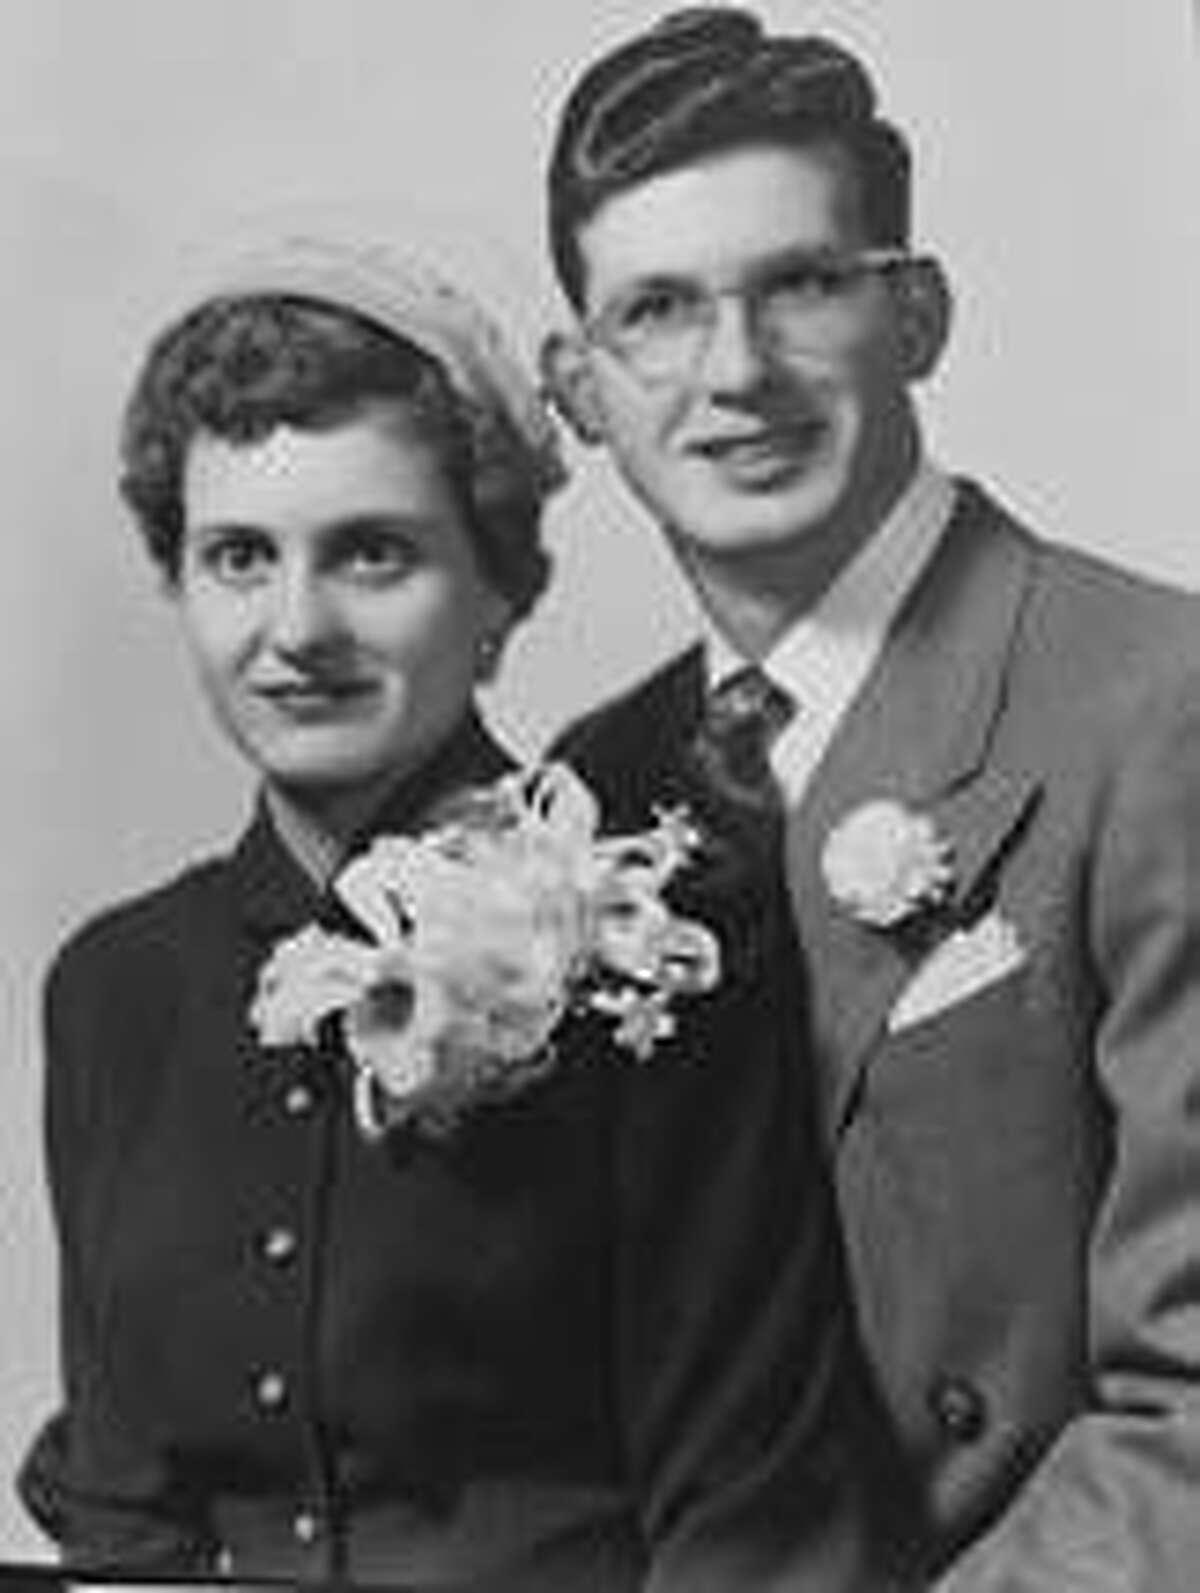 Joe and Susie Bean at their wedding